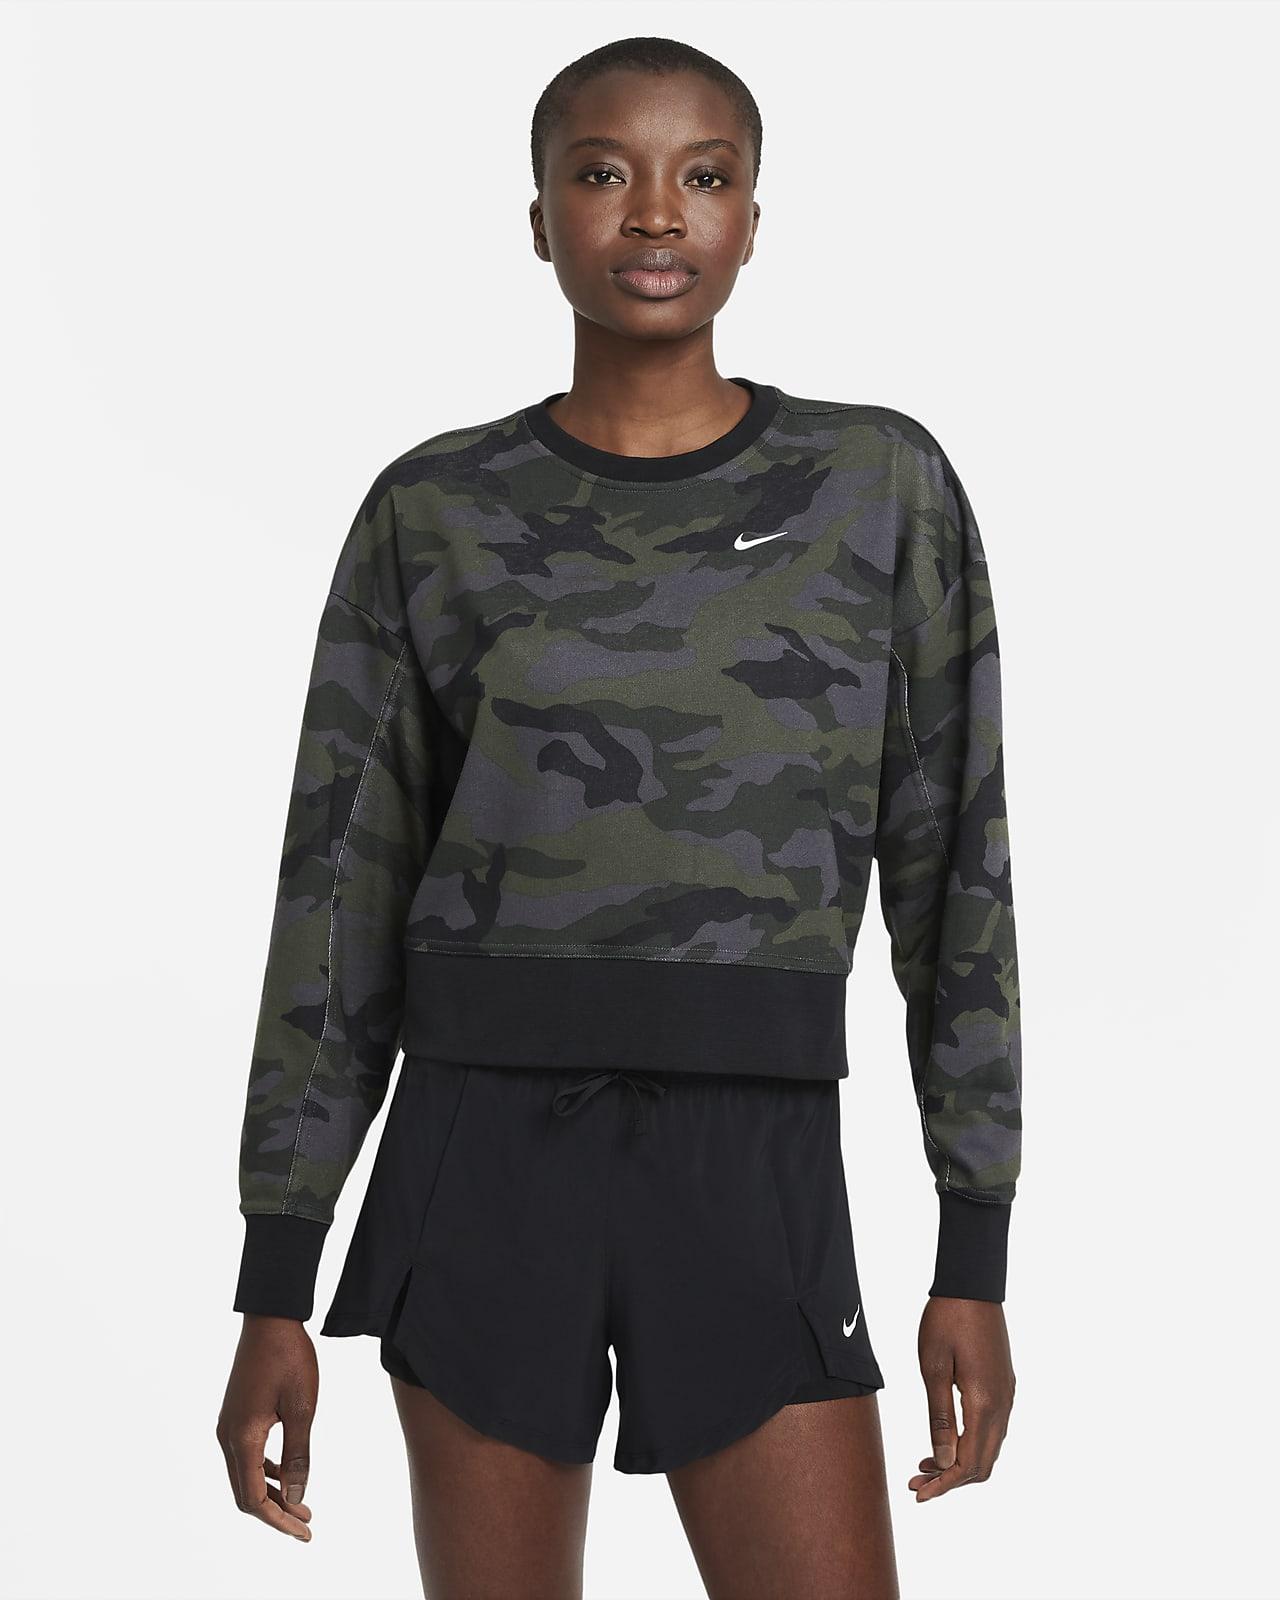 Nike Dri-FIT Get Fit Women's Camo Training Crew